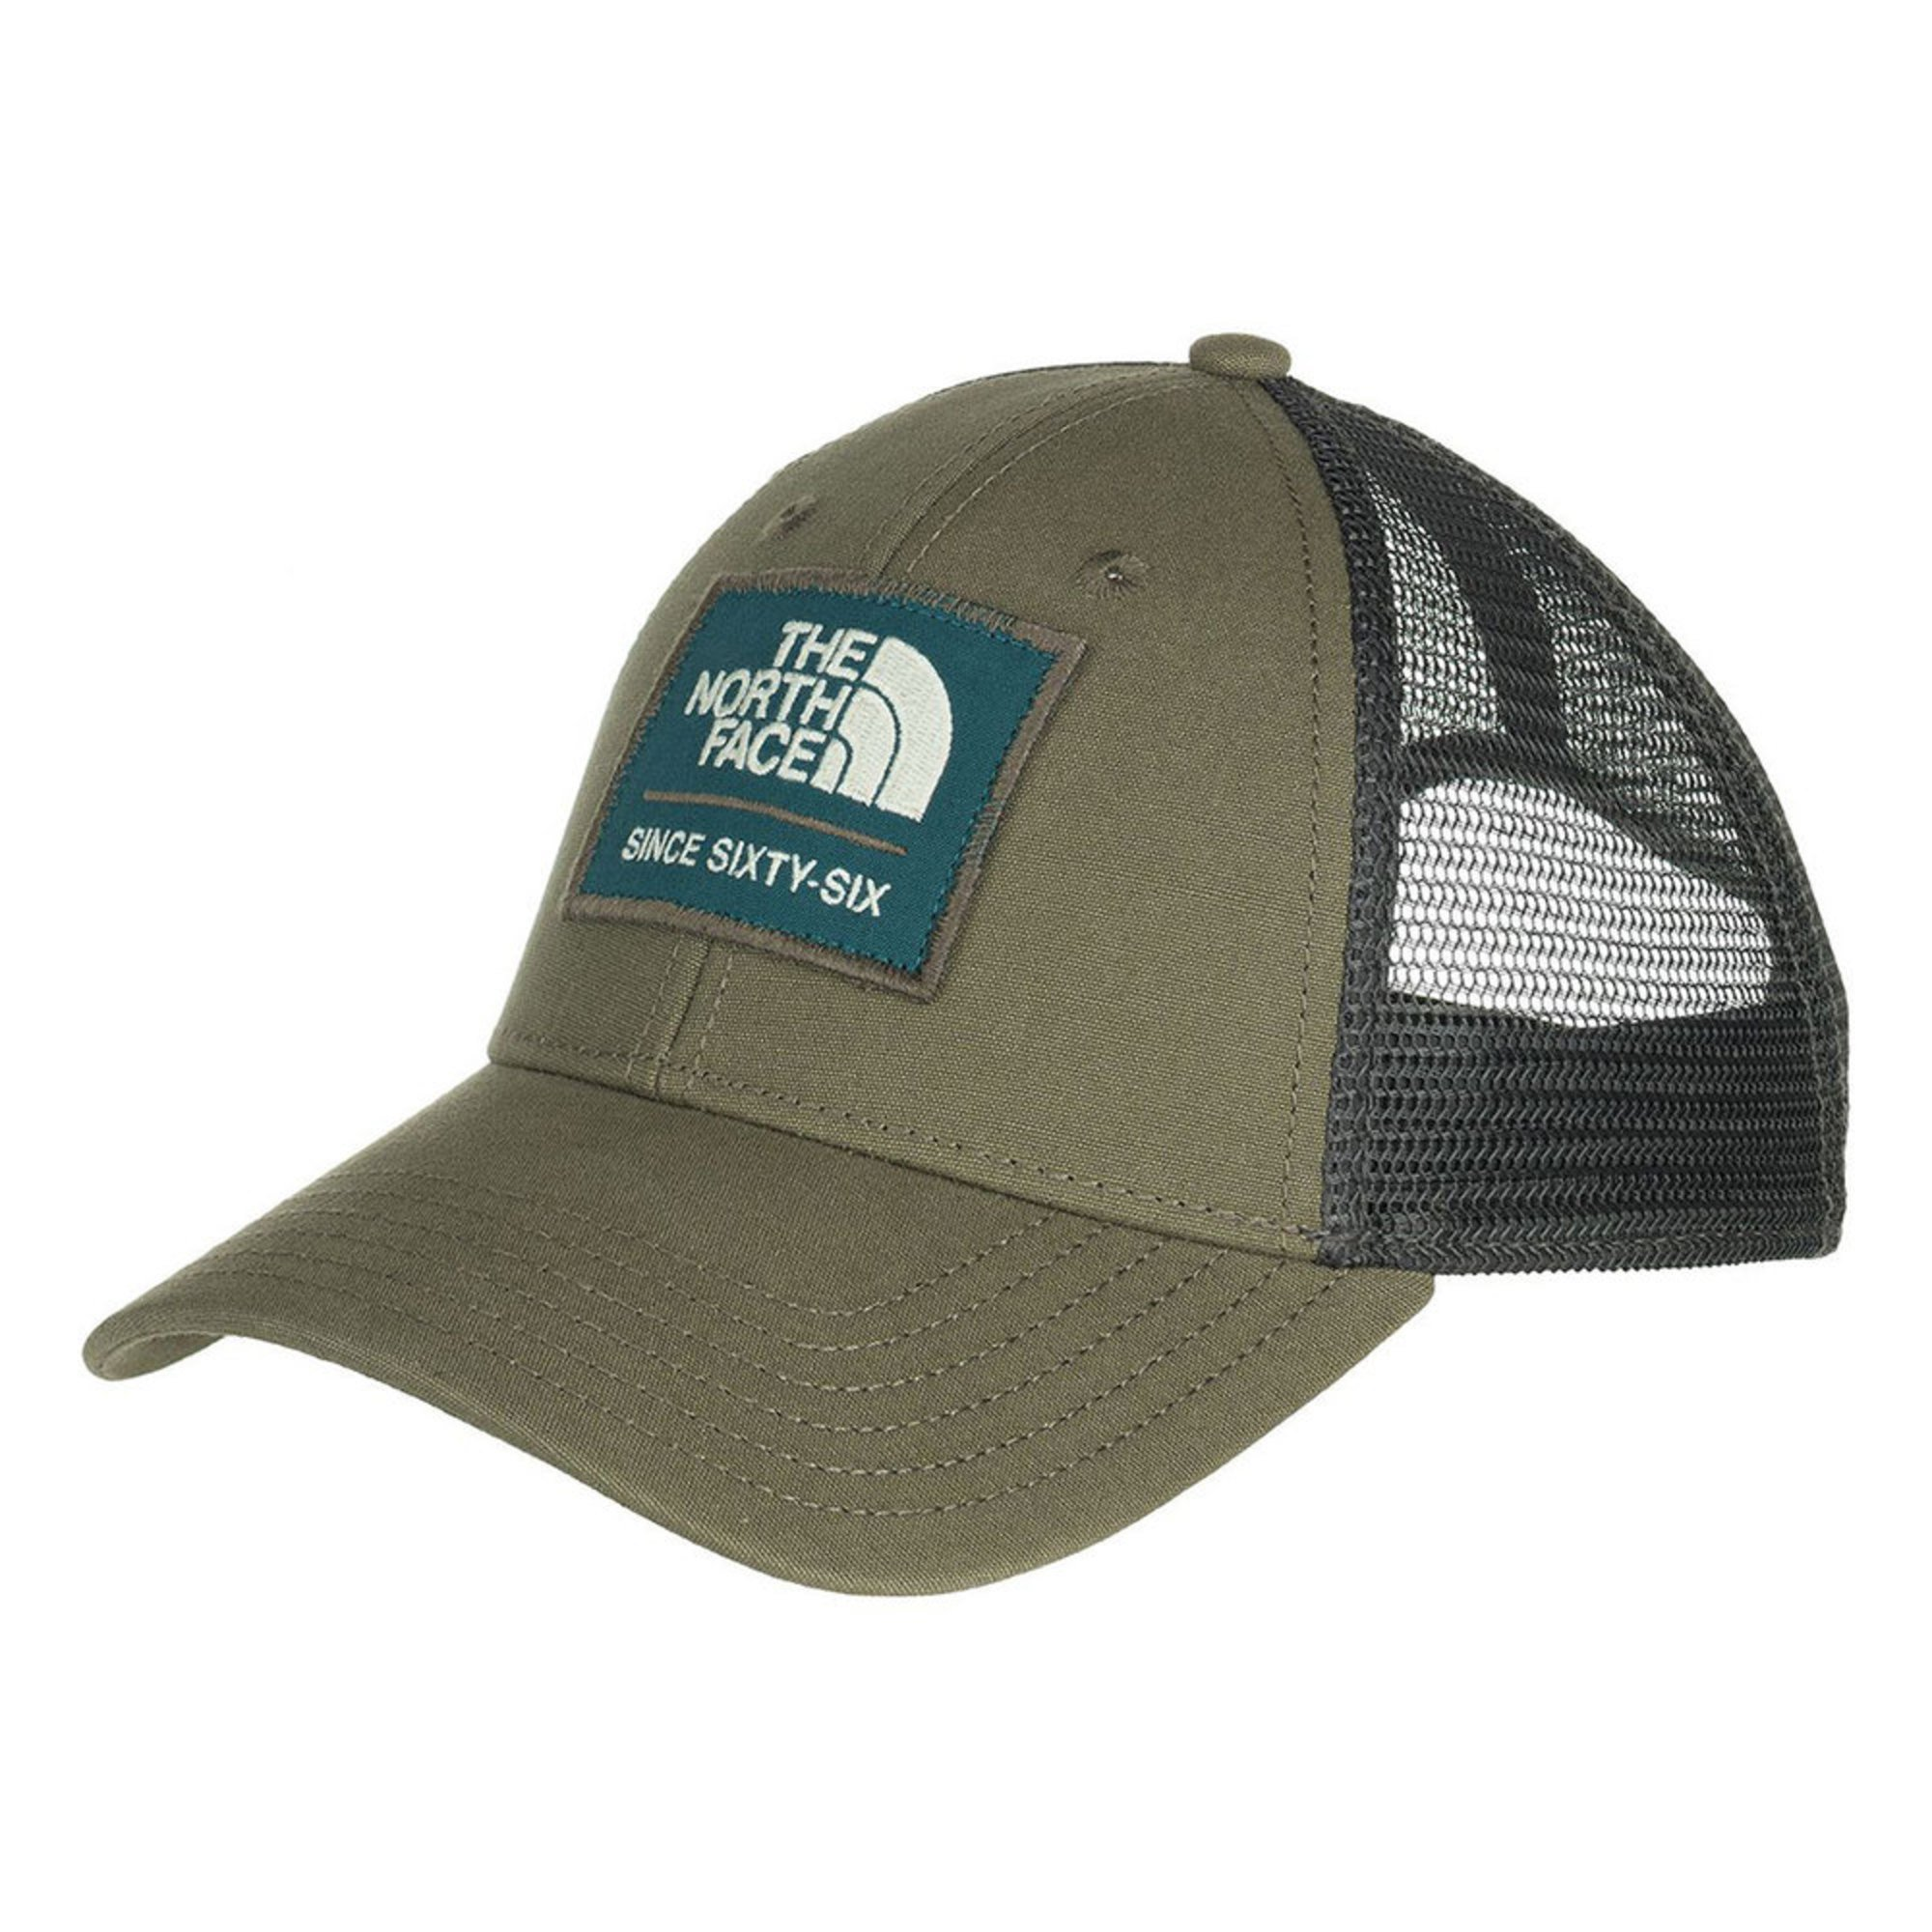 45592f957de The North Face Men's Patches Trucker Hat   Outdoor Hats & Beanies ...